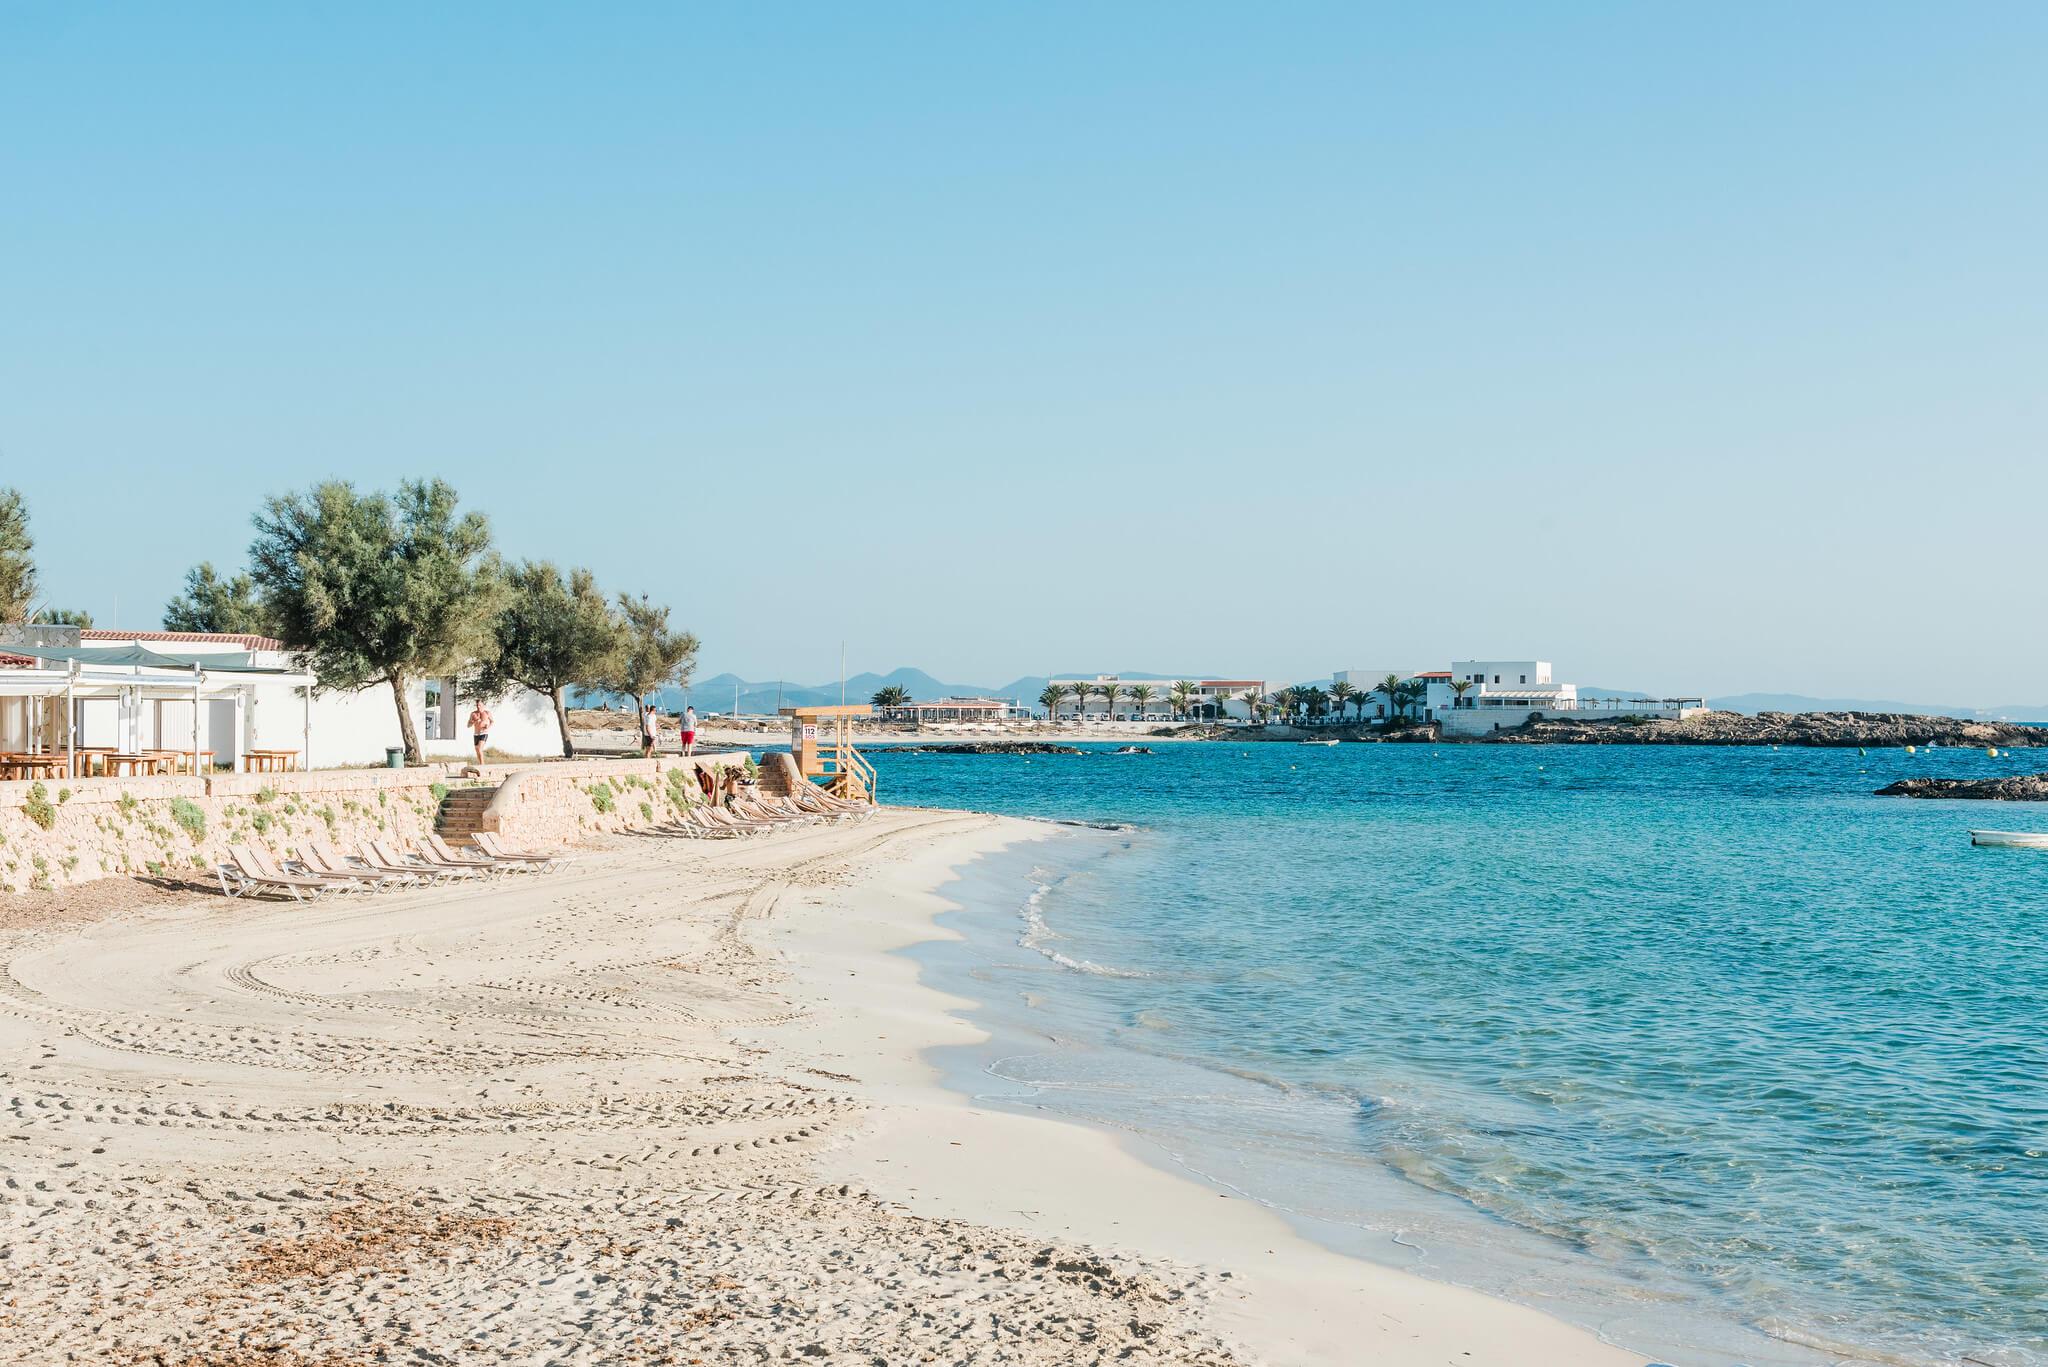 https://www.white-ibiza.com/wp-content/uploads/2020/03/formentera-beaches-es-pujols-2020-09.jpg